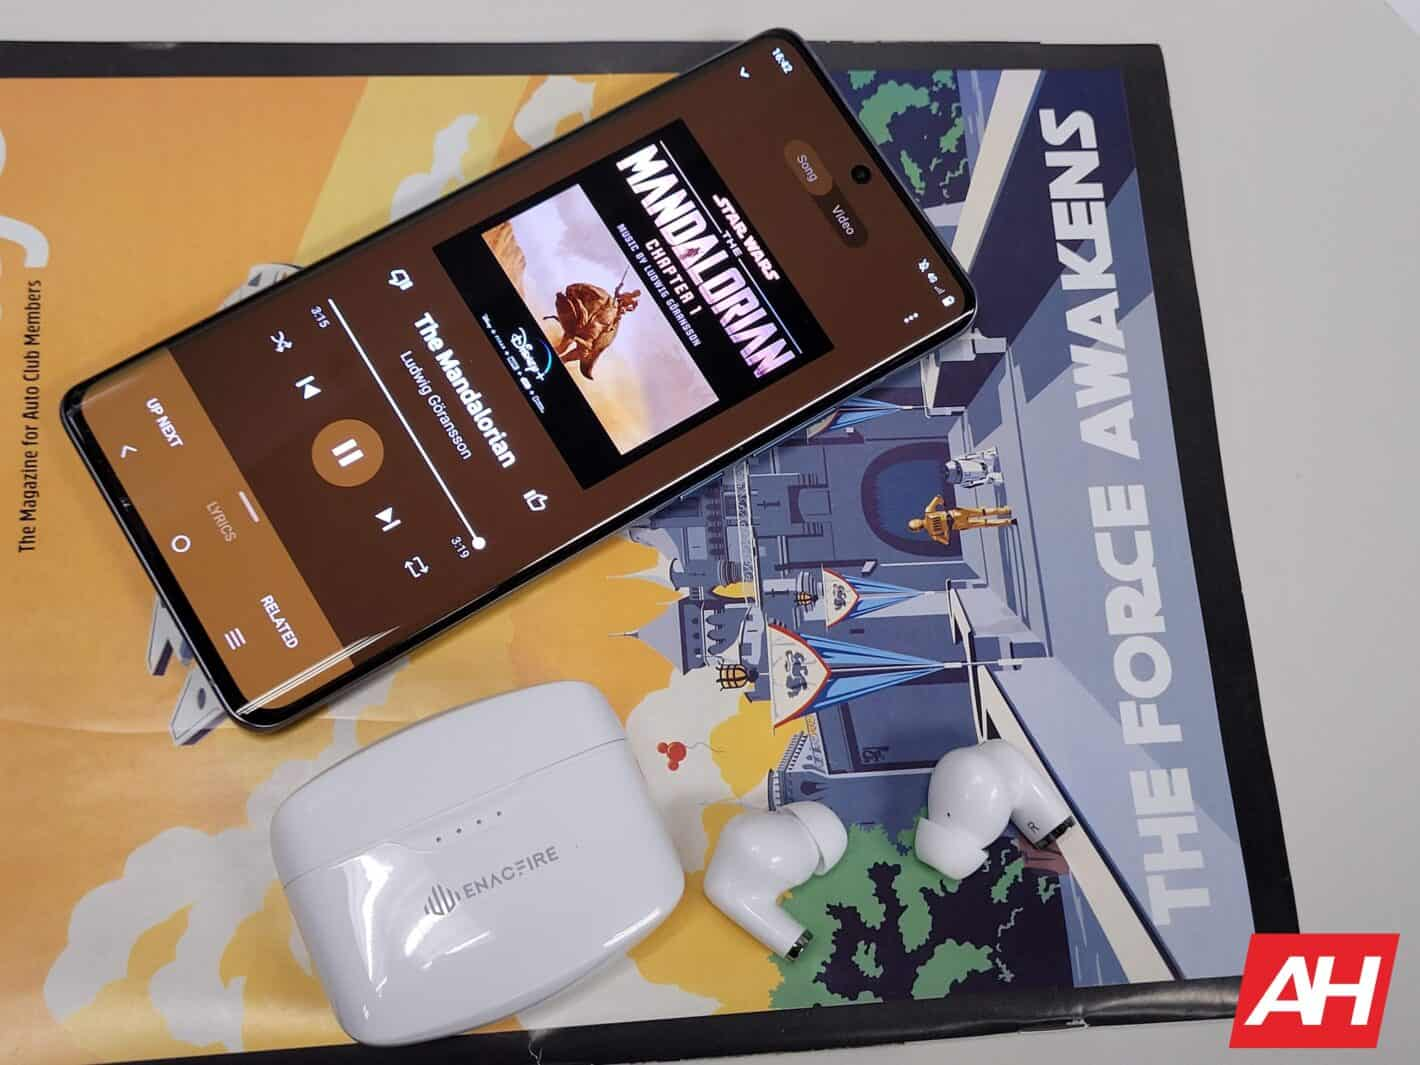 Vivo X60 Pro AH HR Audio